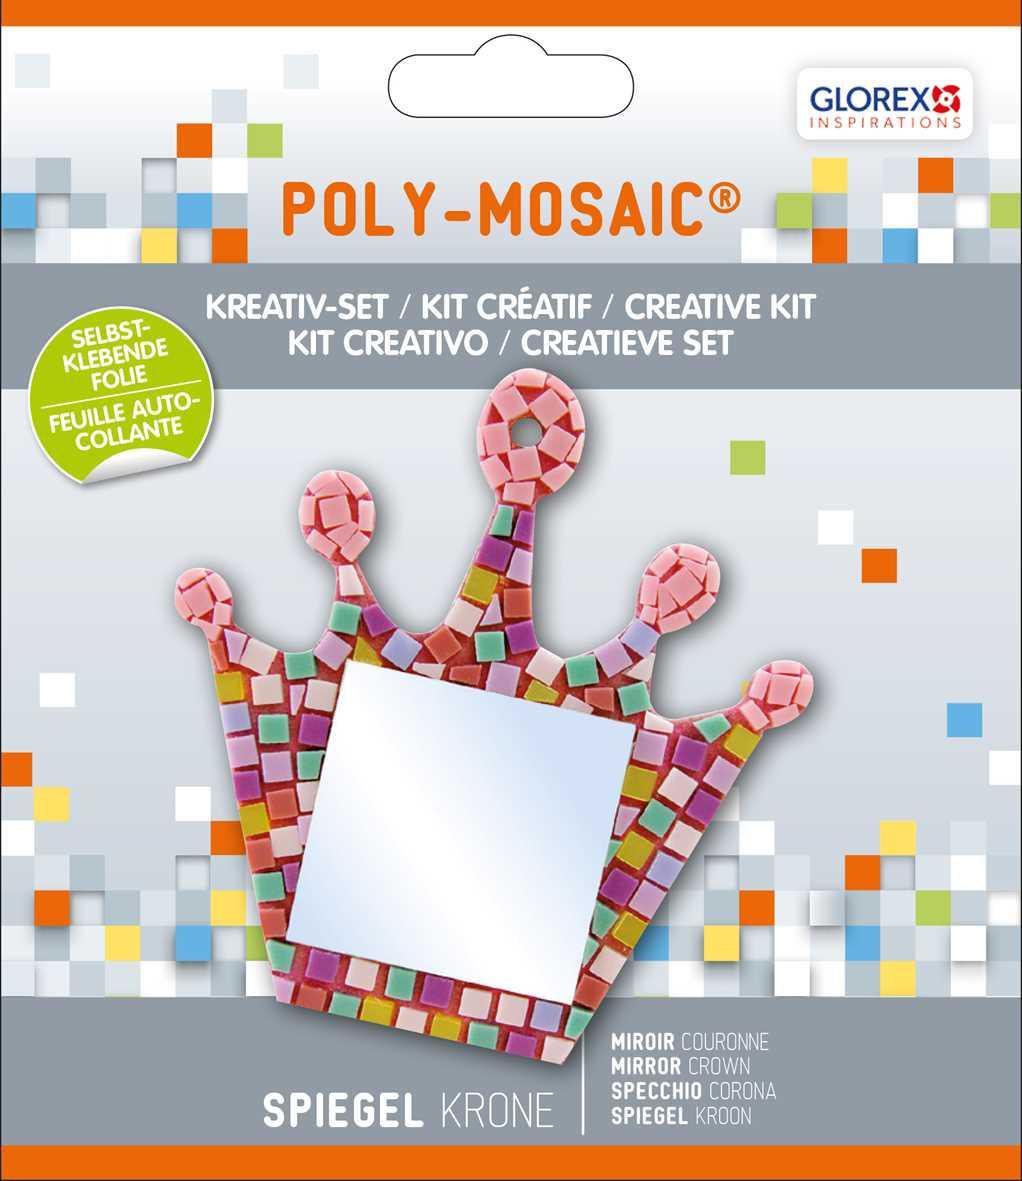 Kreativ set selbstklebendes poly mosaik spiegel krone 41142 mosaik shop selbstklebendes mosaik - Mosaiksteine spiegel ...